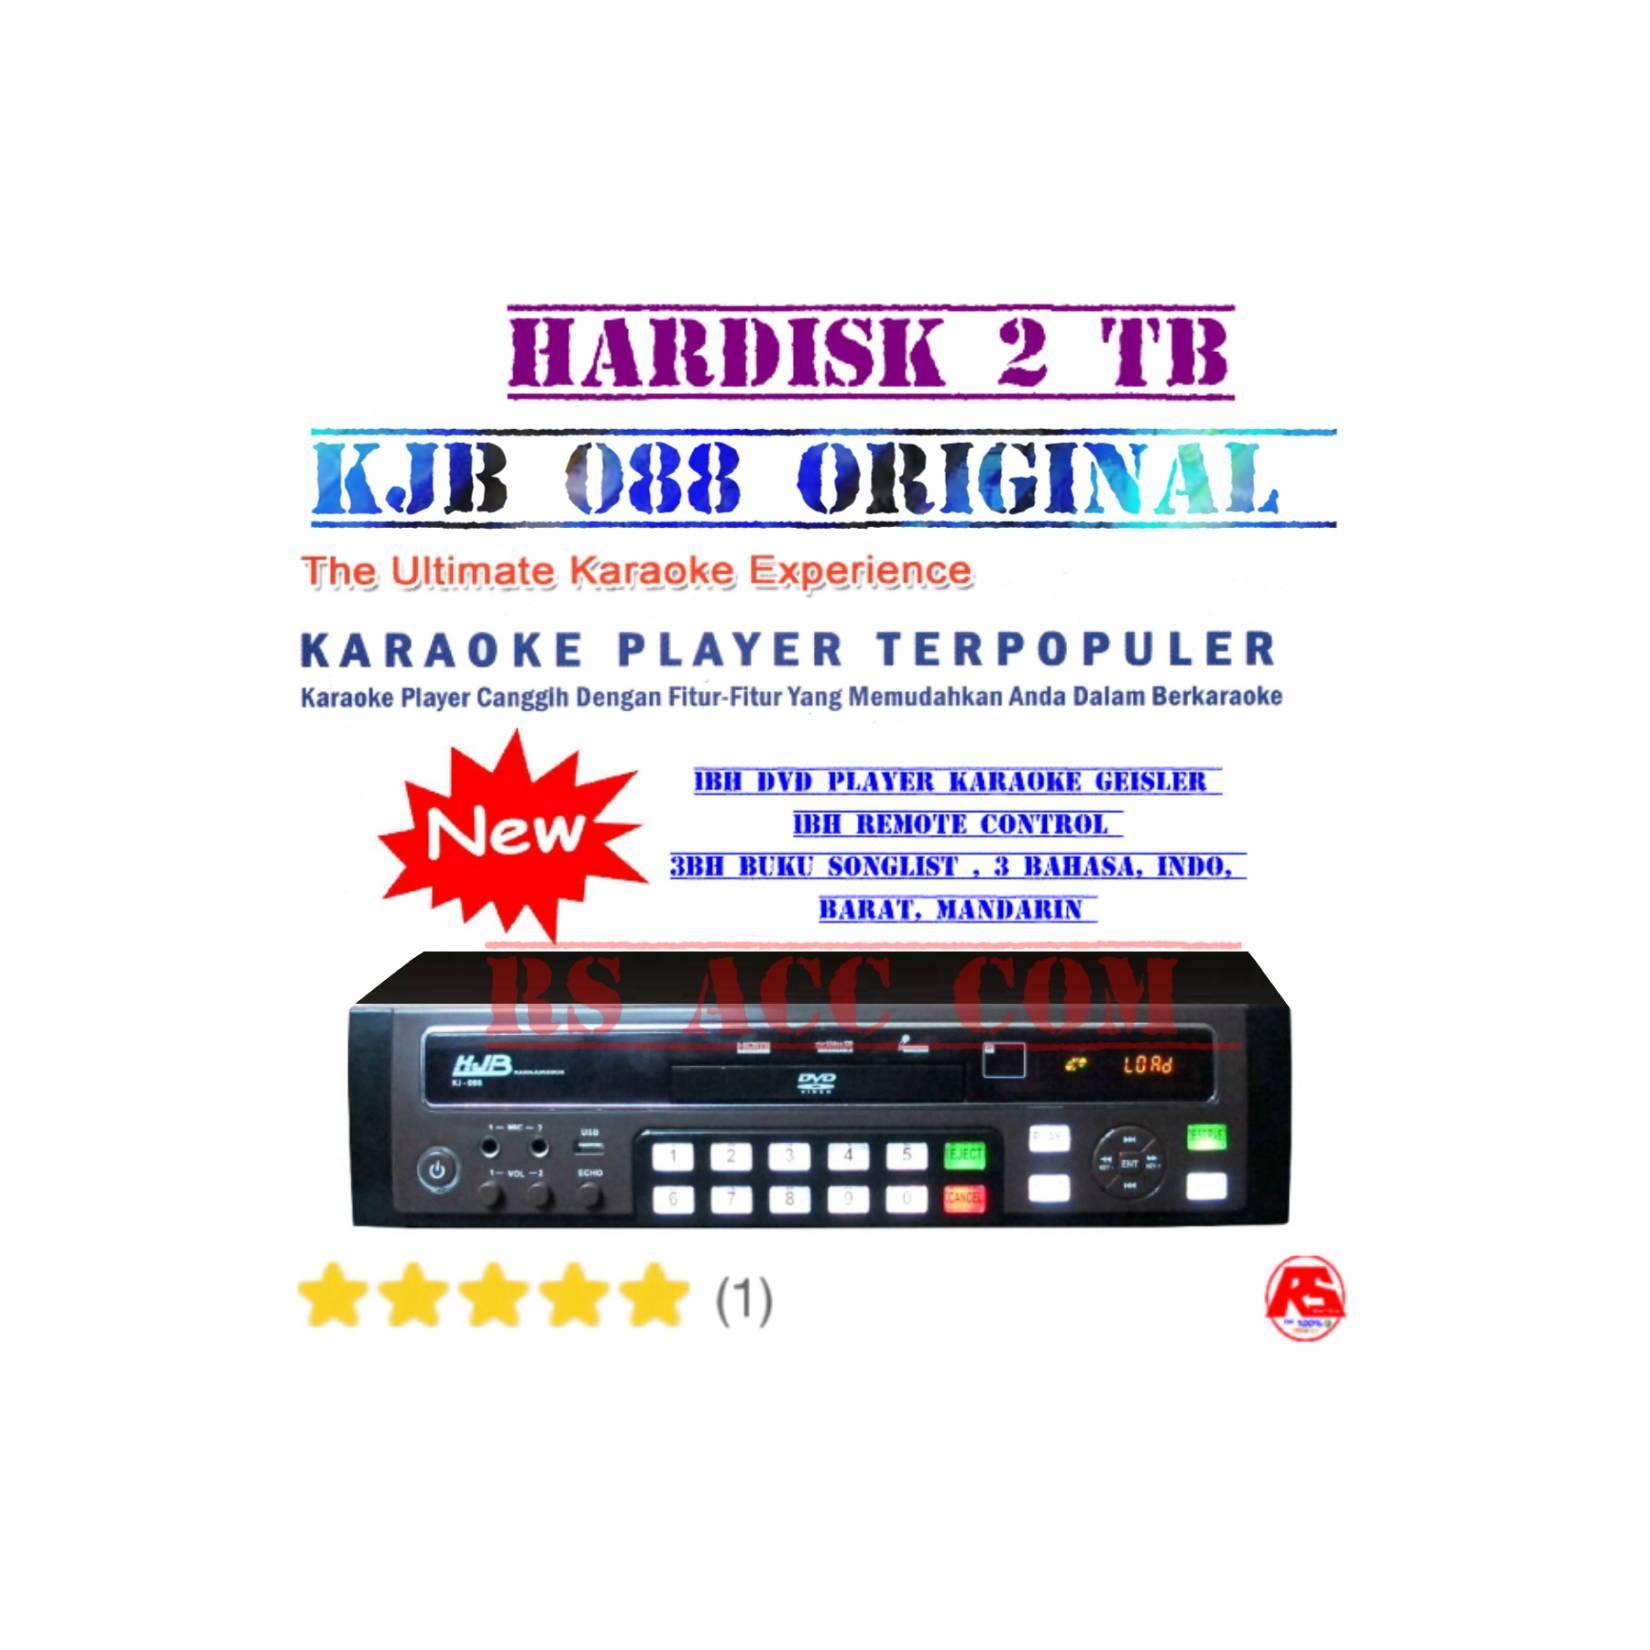 Dvd Super Karaoke Kjb 088 Hardisk 2Tb Isi Full Lagu